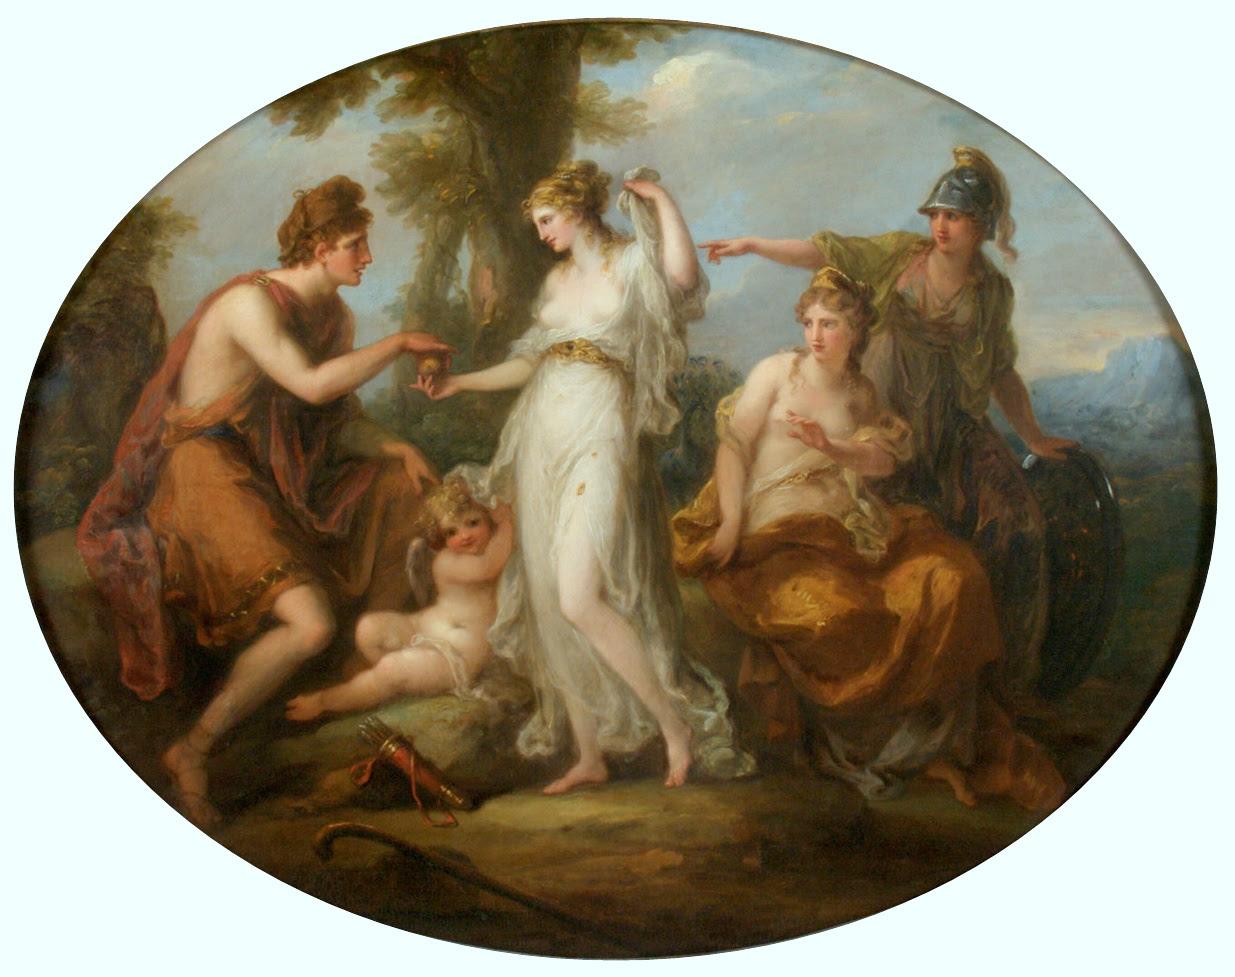 The Judgement of Paris - Angelica Kauffman